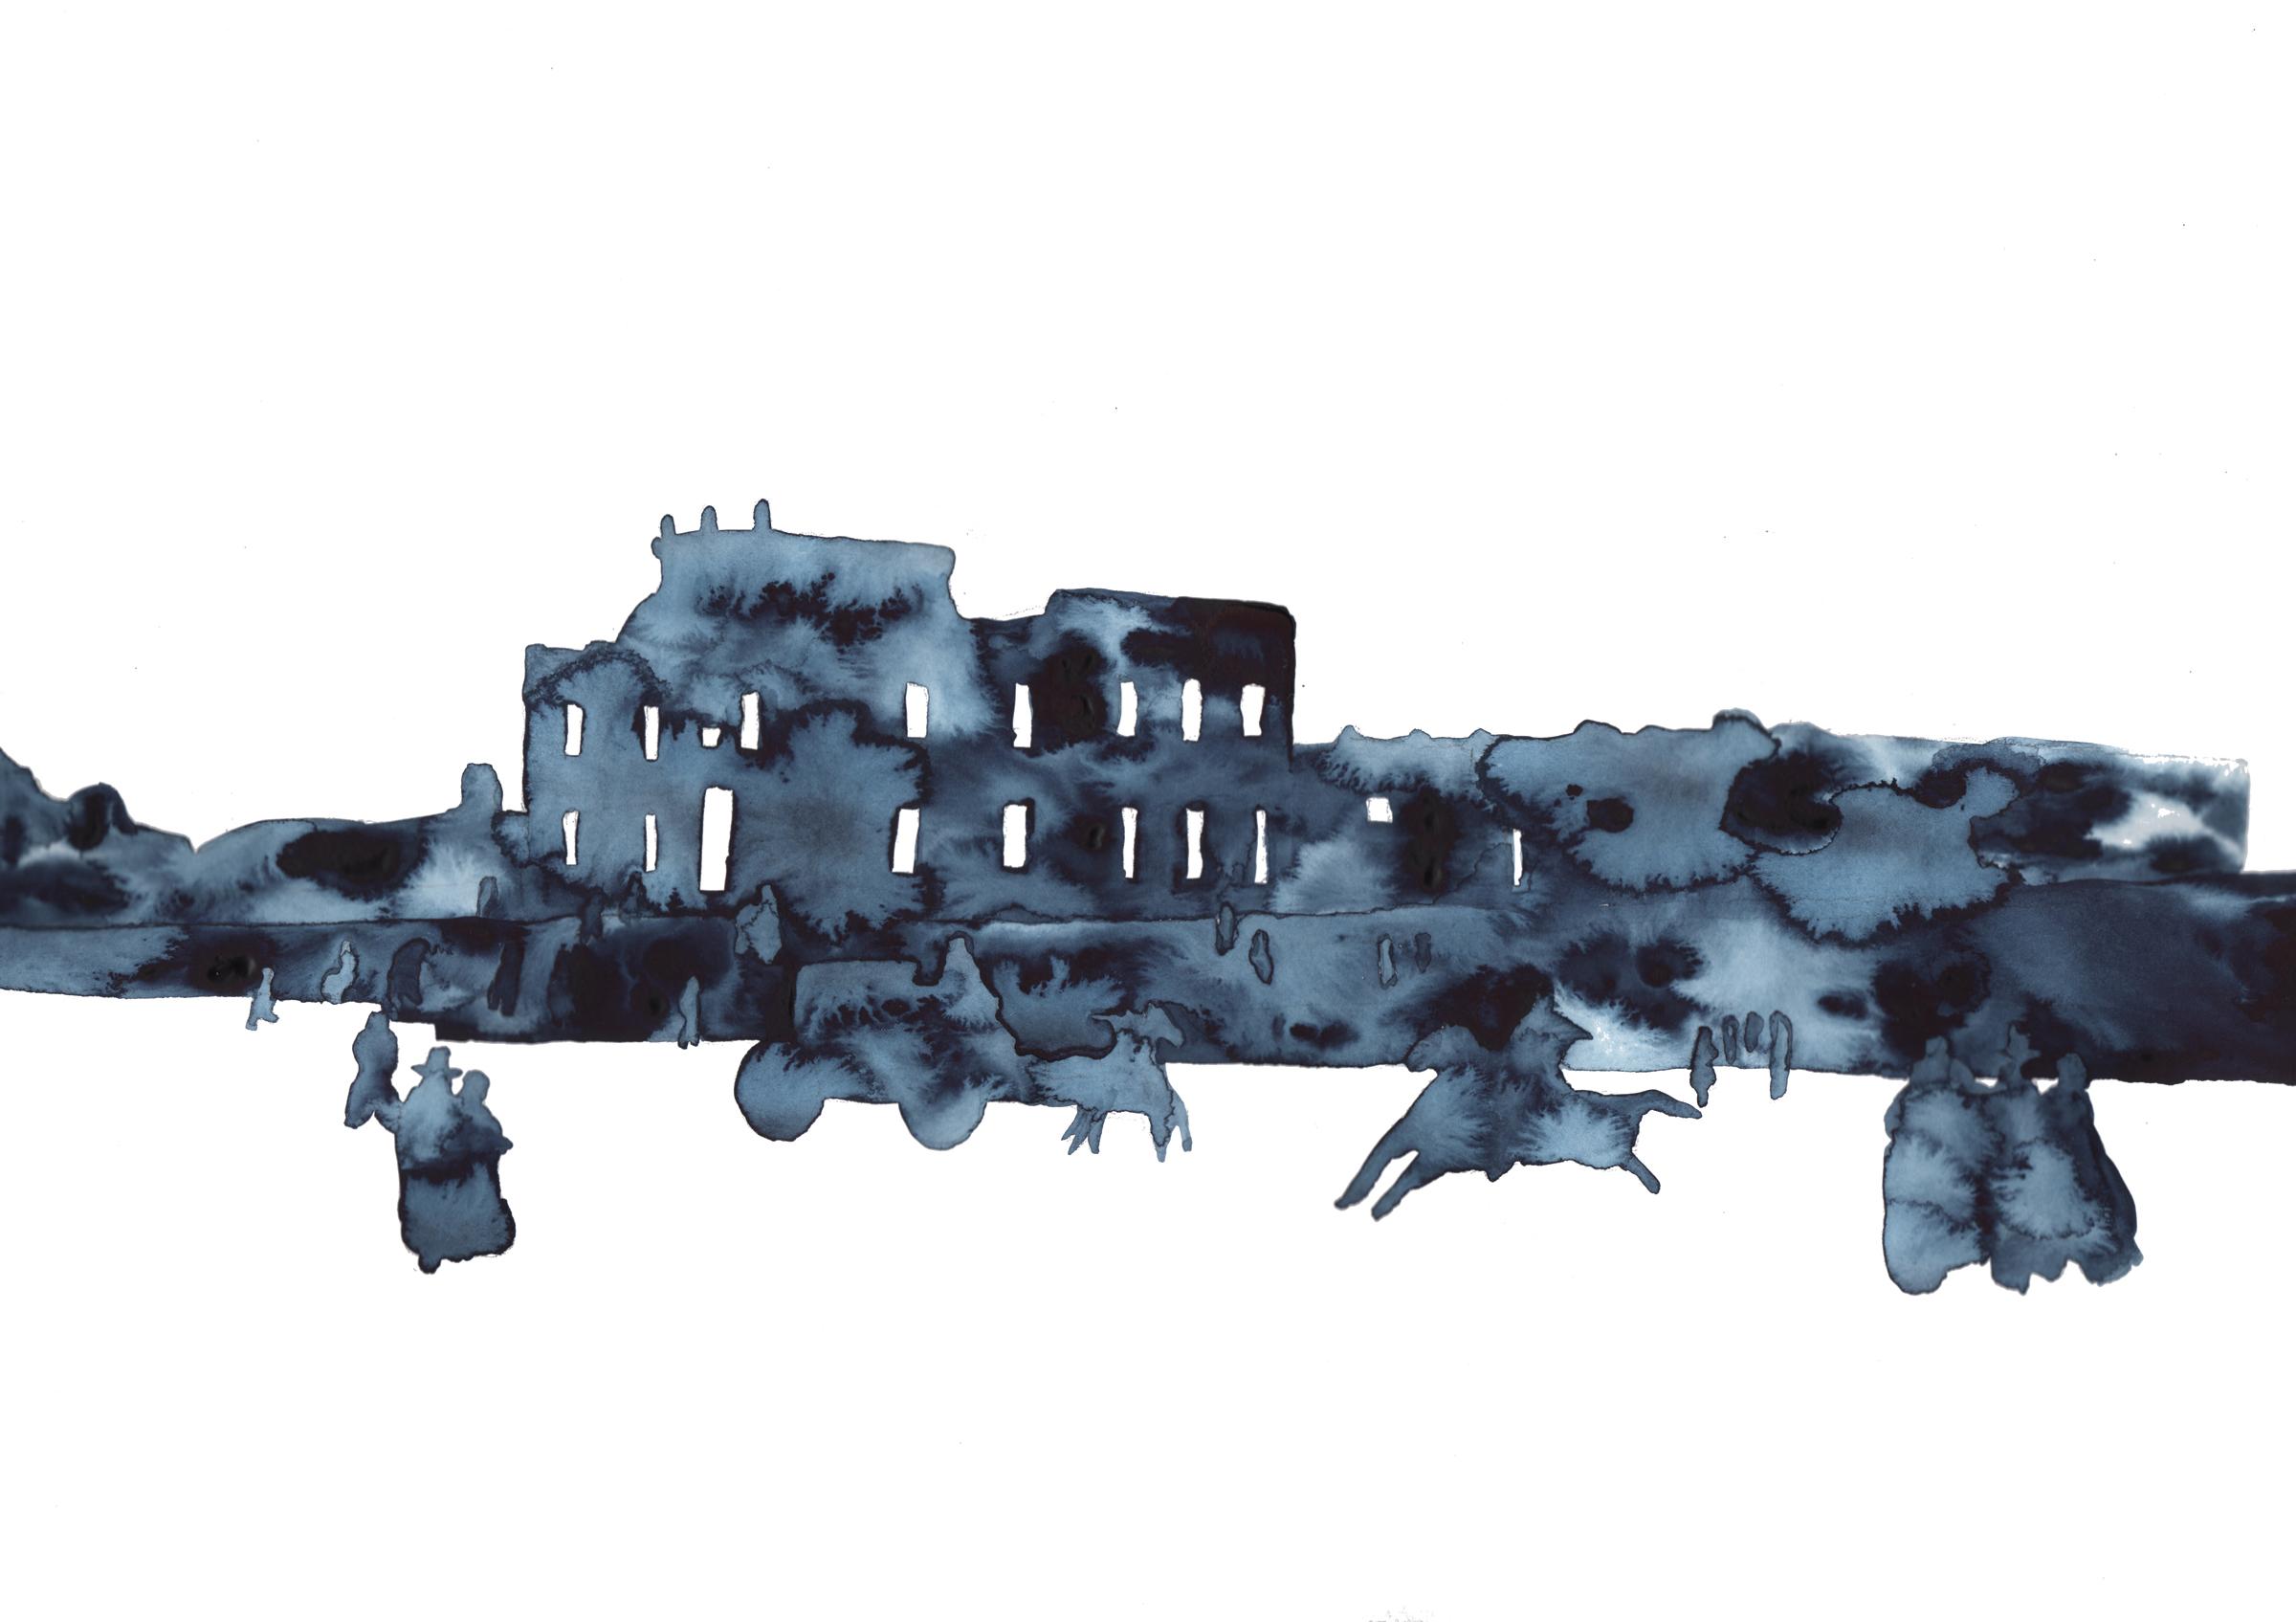 Manfred_Naescher_Nitroglyzerin_und_Chloroform___Broadstone_Railway_Station_1847__Watercolor_on_Fabriano-Paper_30x40cm_2015.jpg